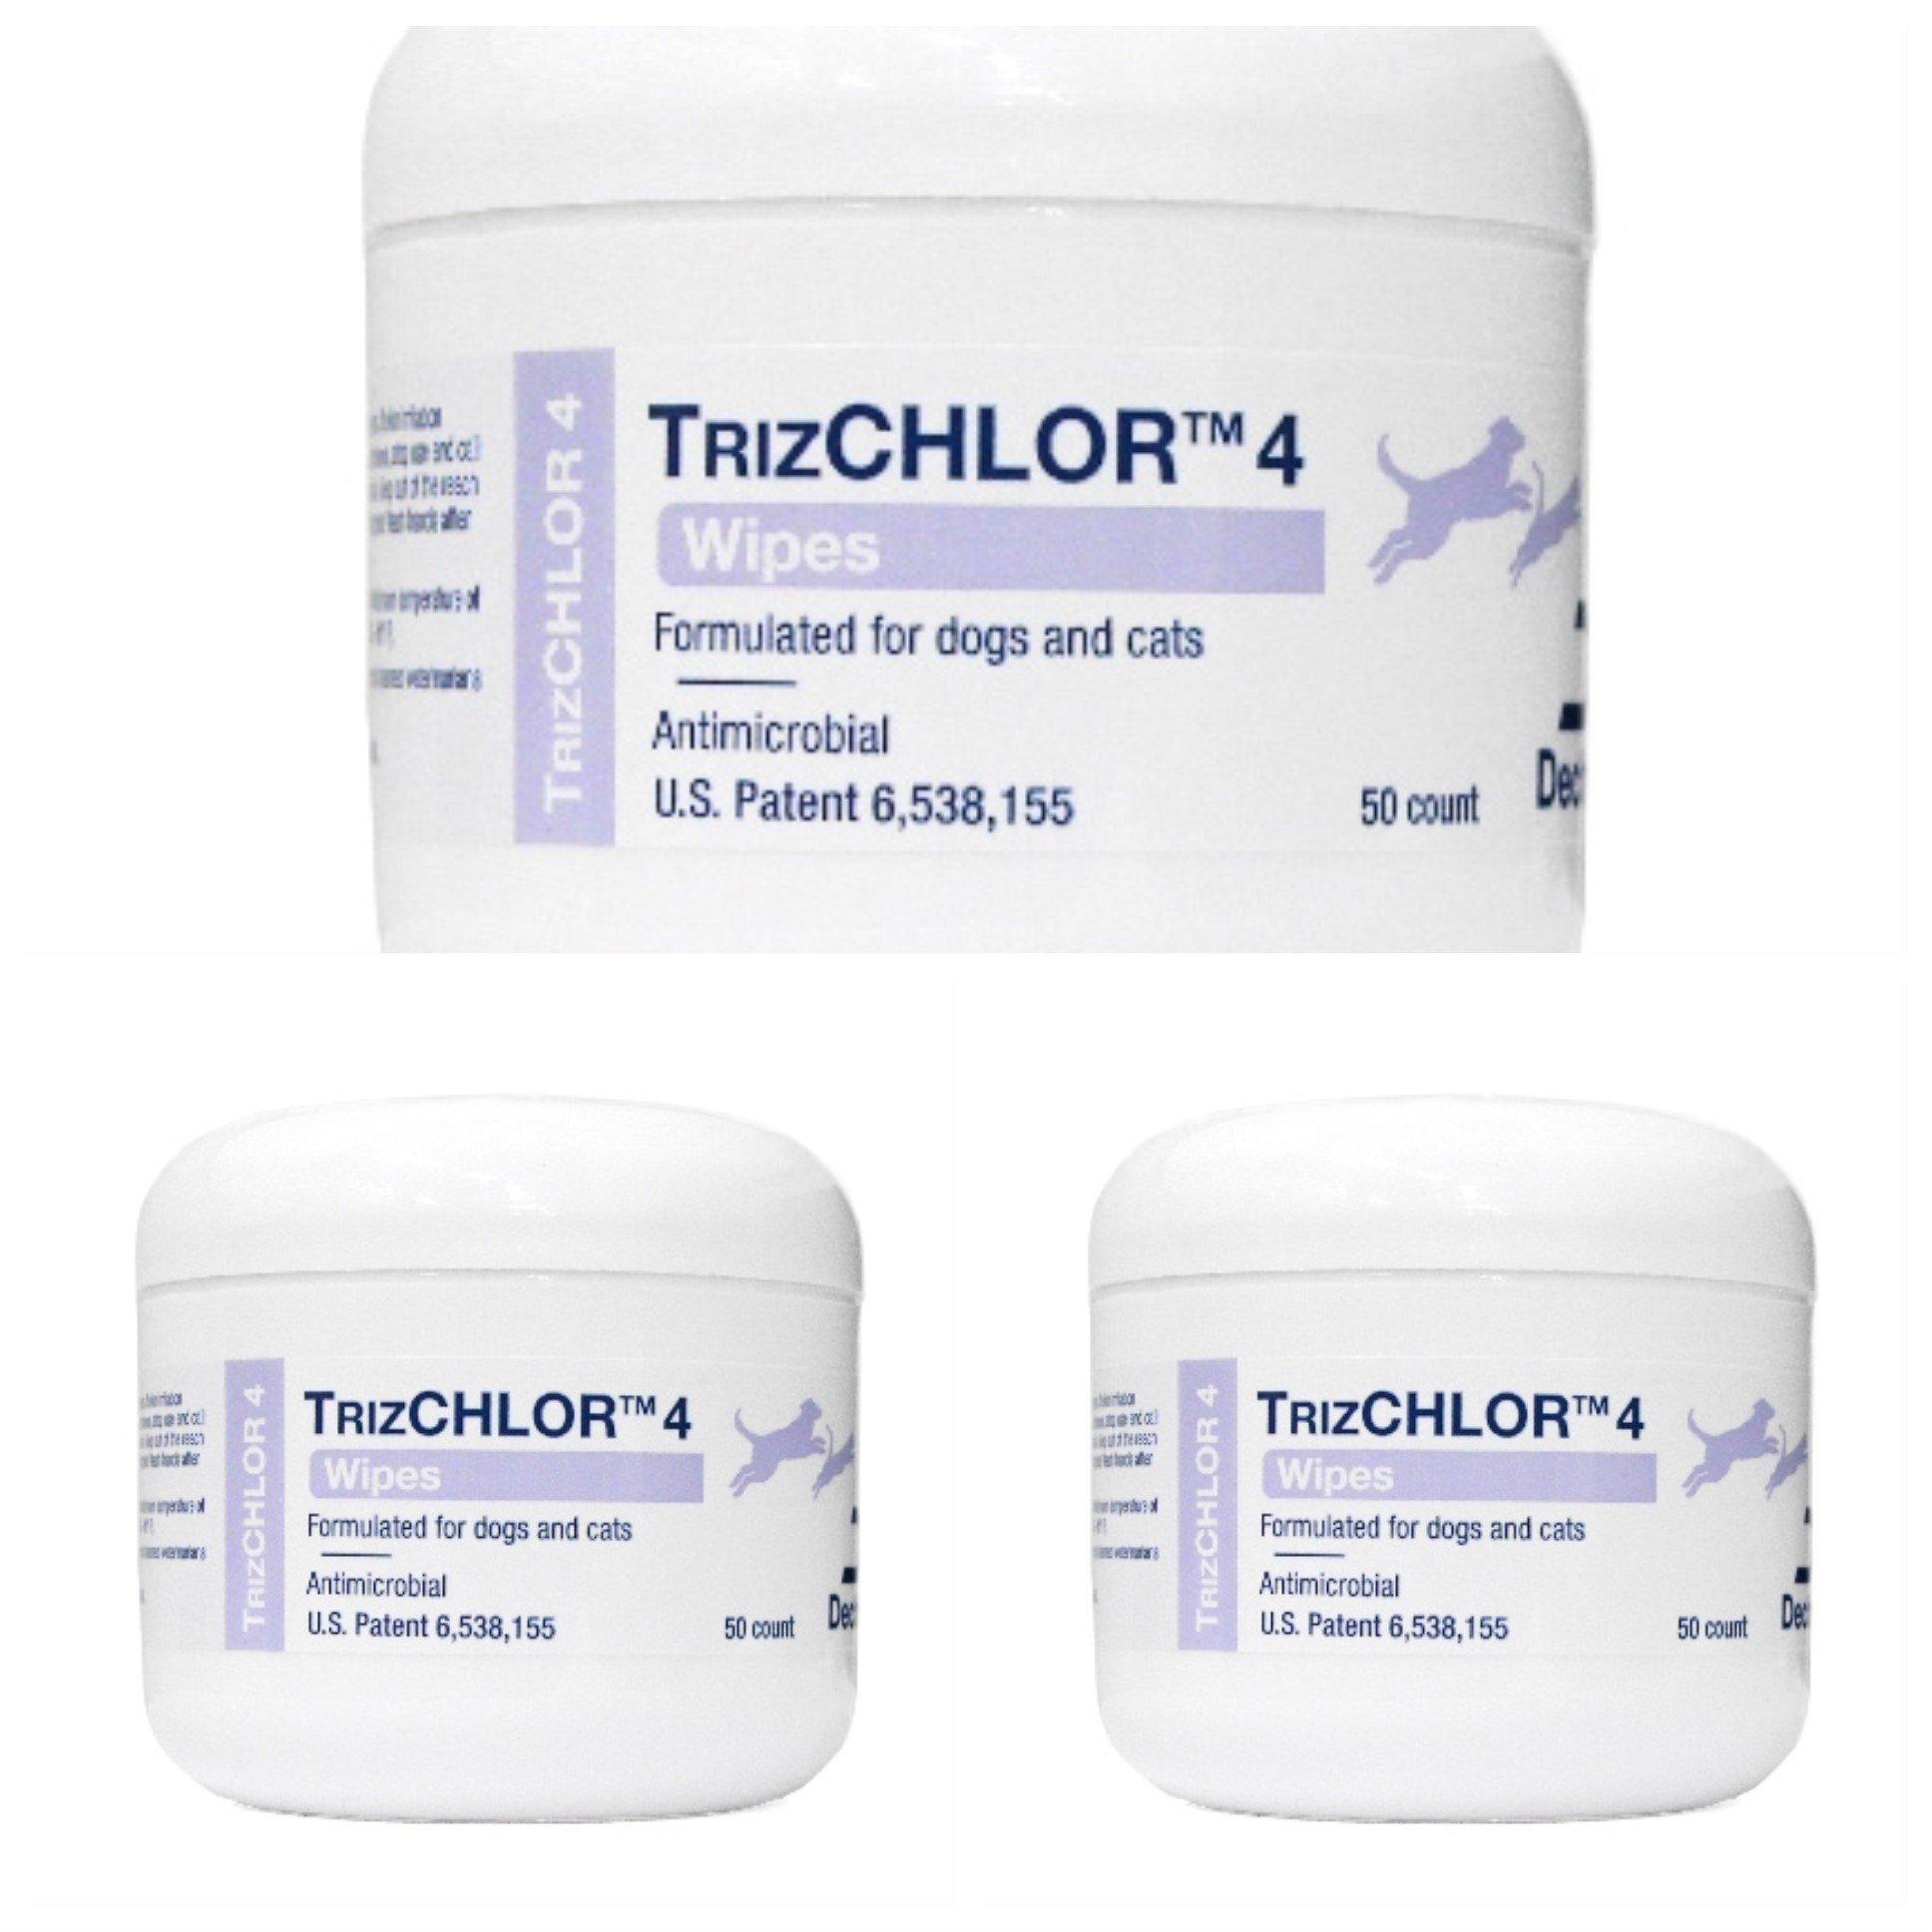 TRIZCHLOR 4 Dechra Pet Wipes, 50 Each, 3 Pack by TRIZCHLOR 4